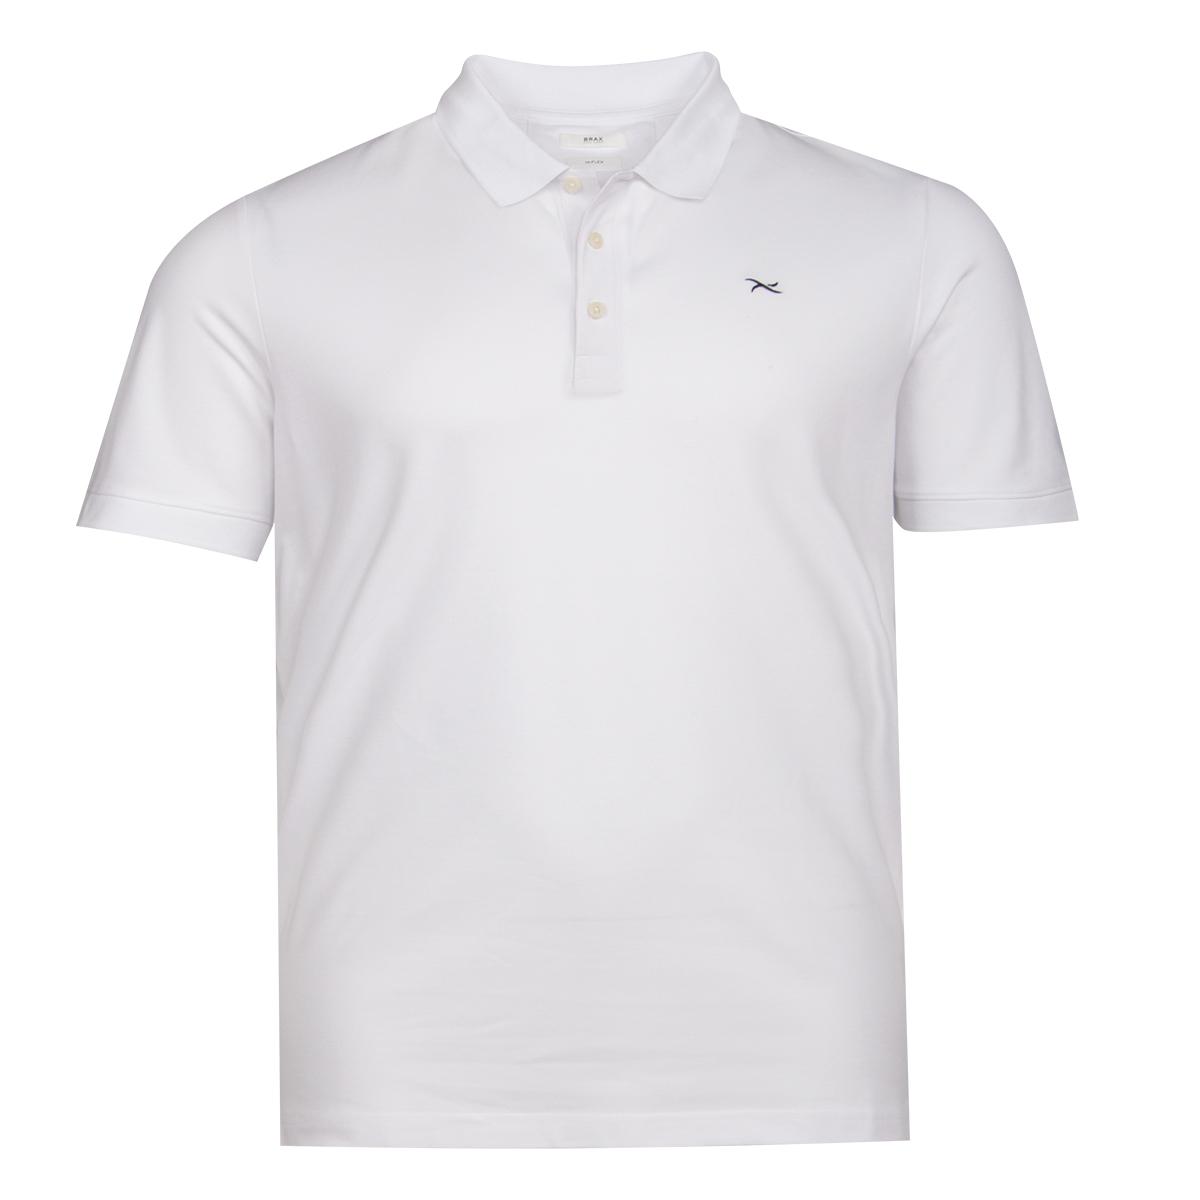 wholesale release info on best sell Brax Hi-Flex Poloshirt weiß